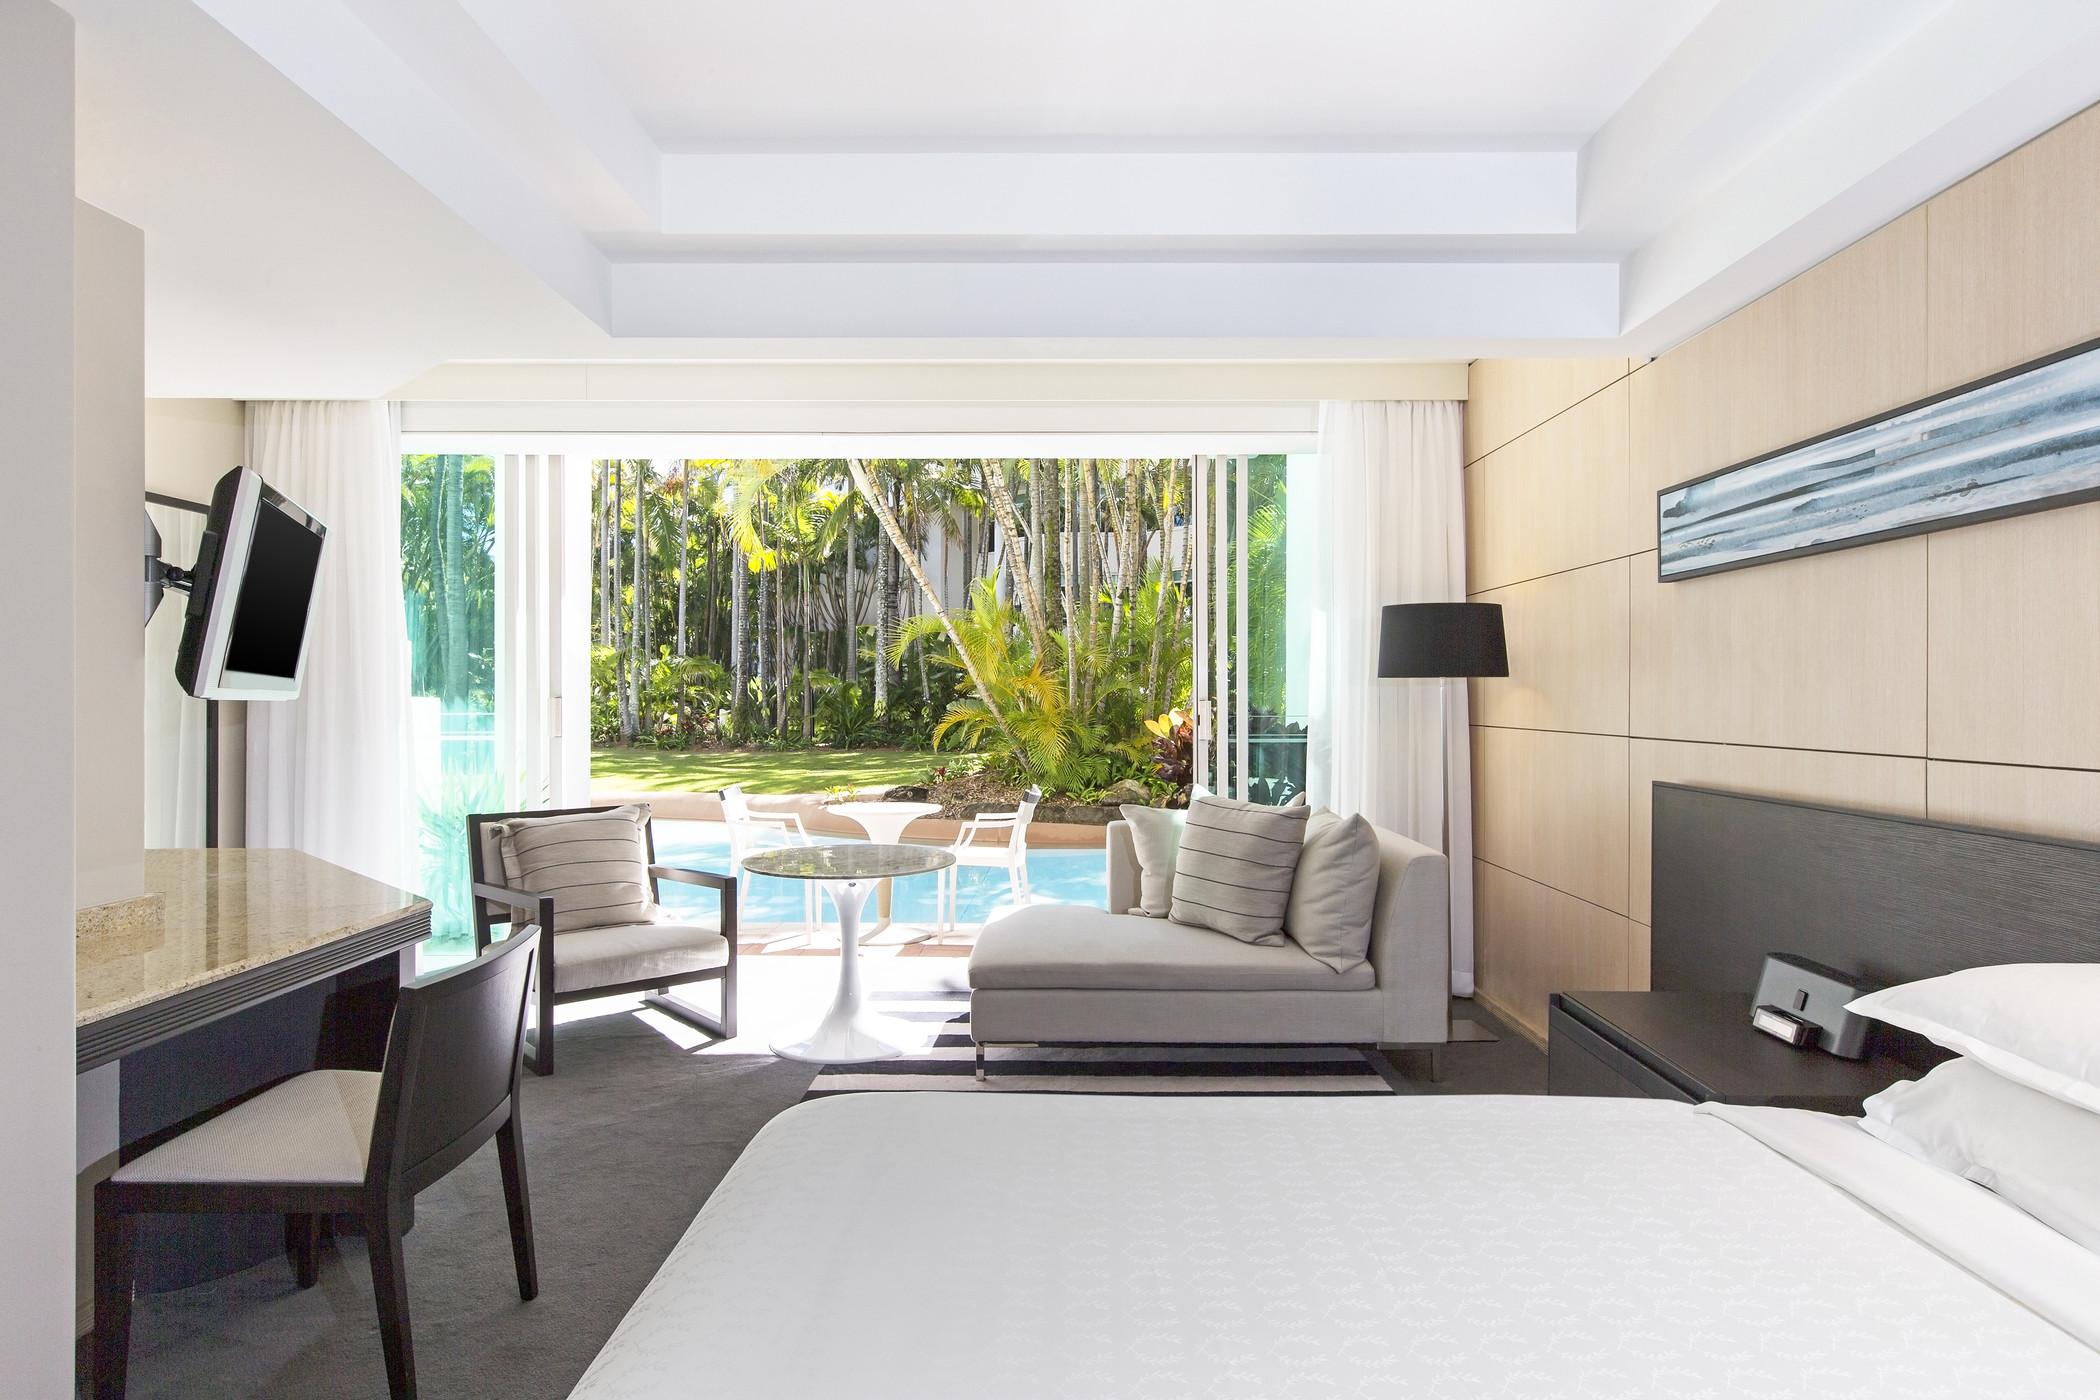 Sheraton-Mirage-Lagoon King Bed